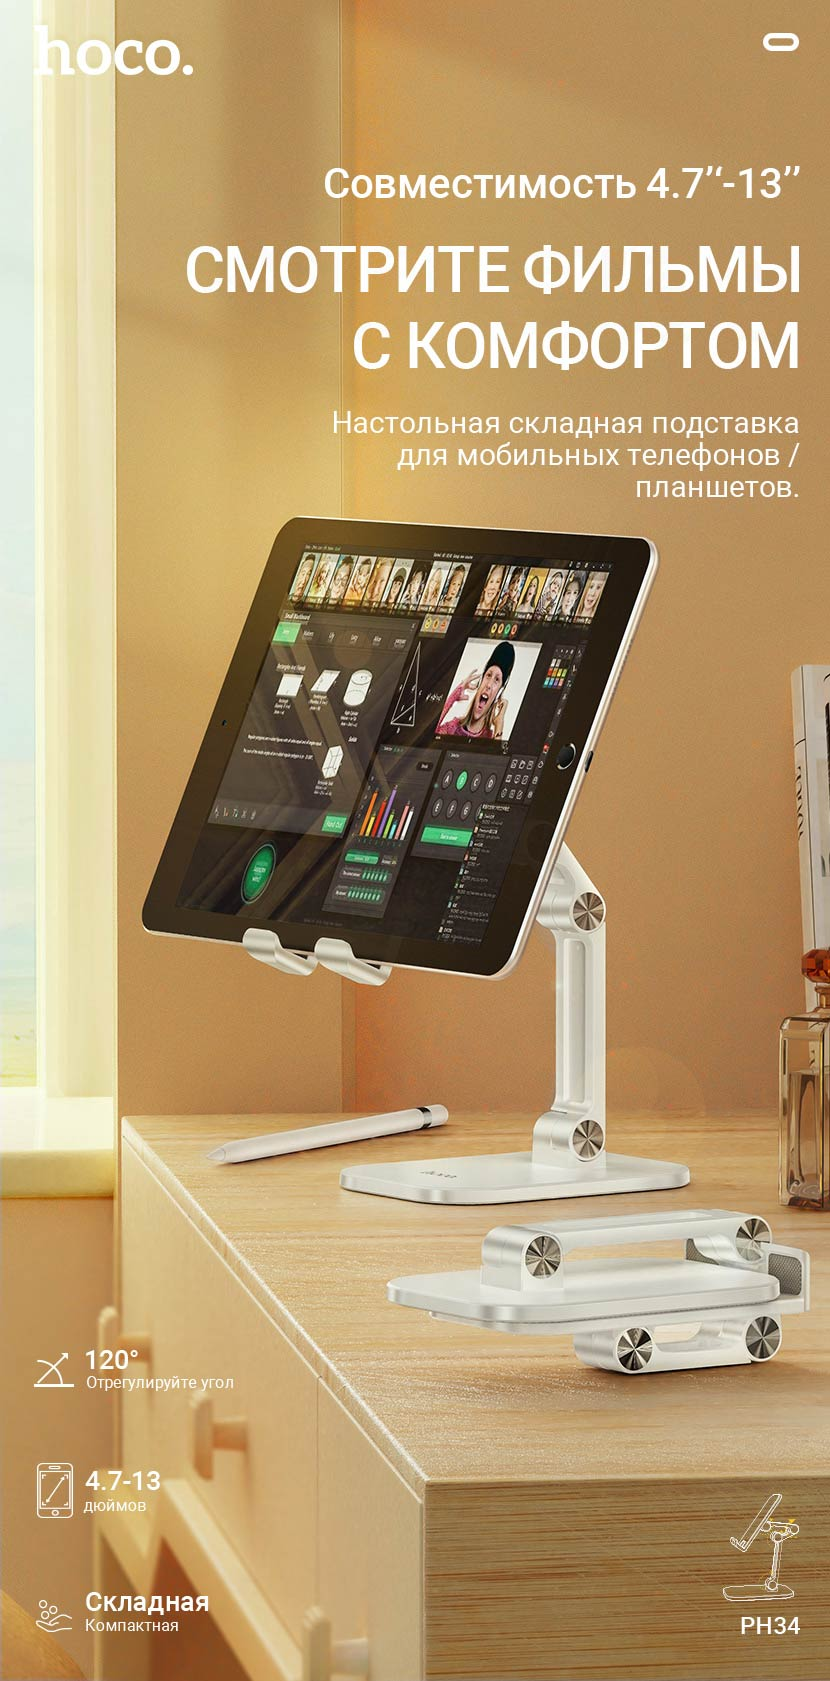 hoco news ph34 excelente double folding desktop stand ru